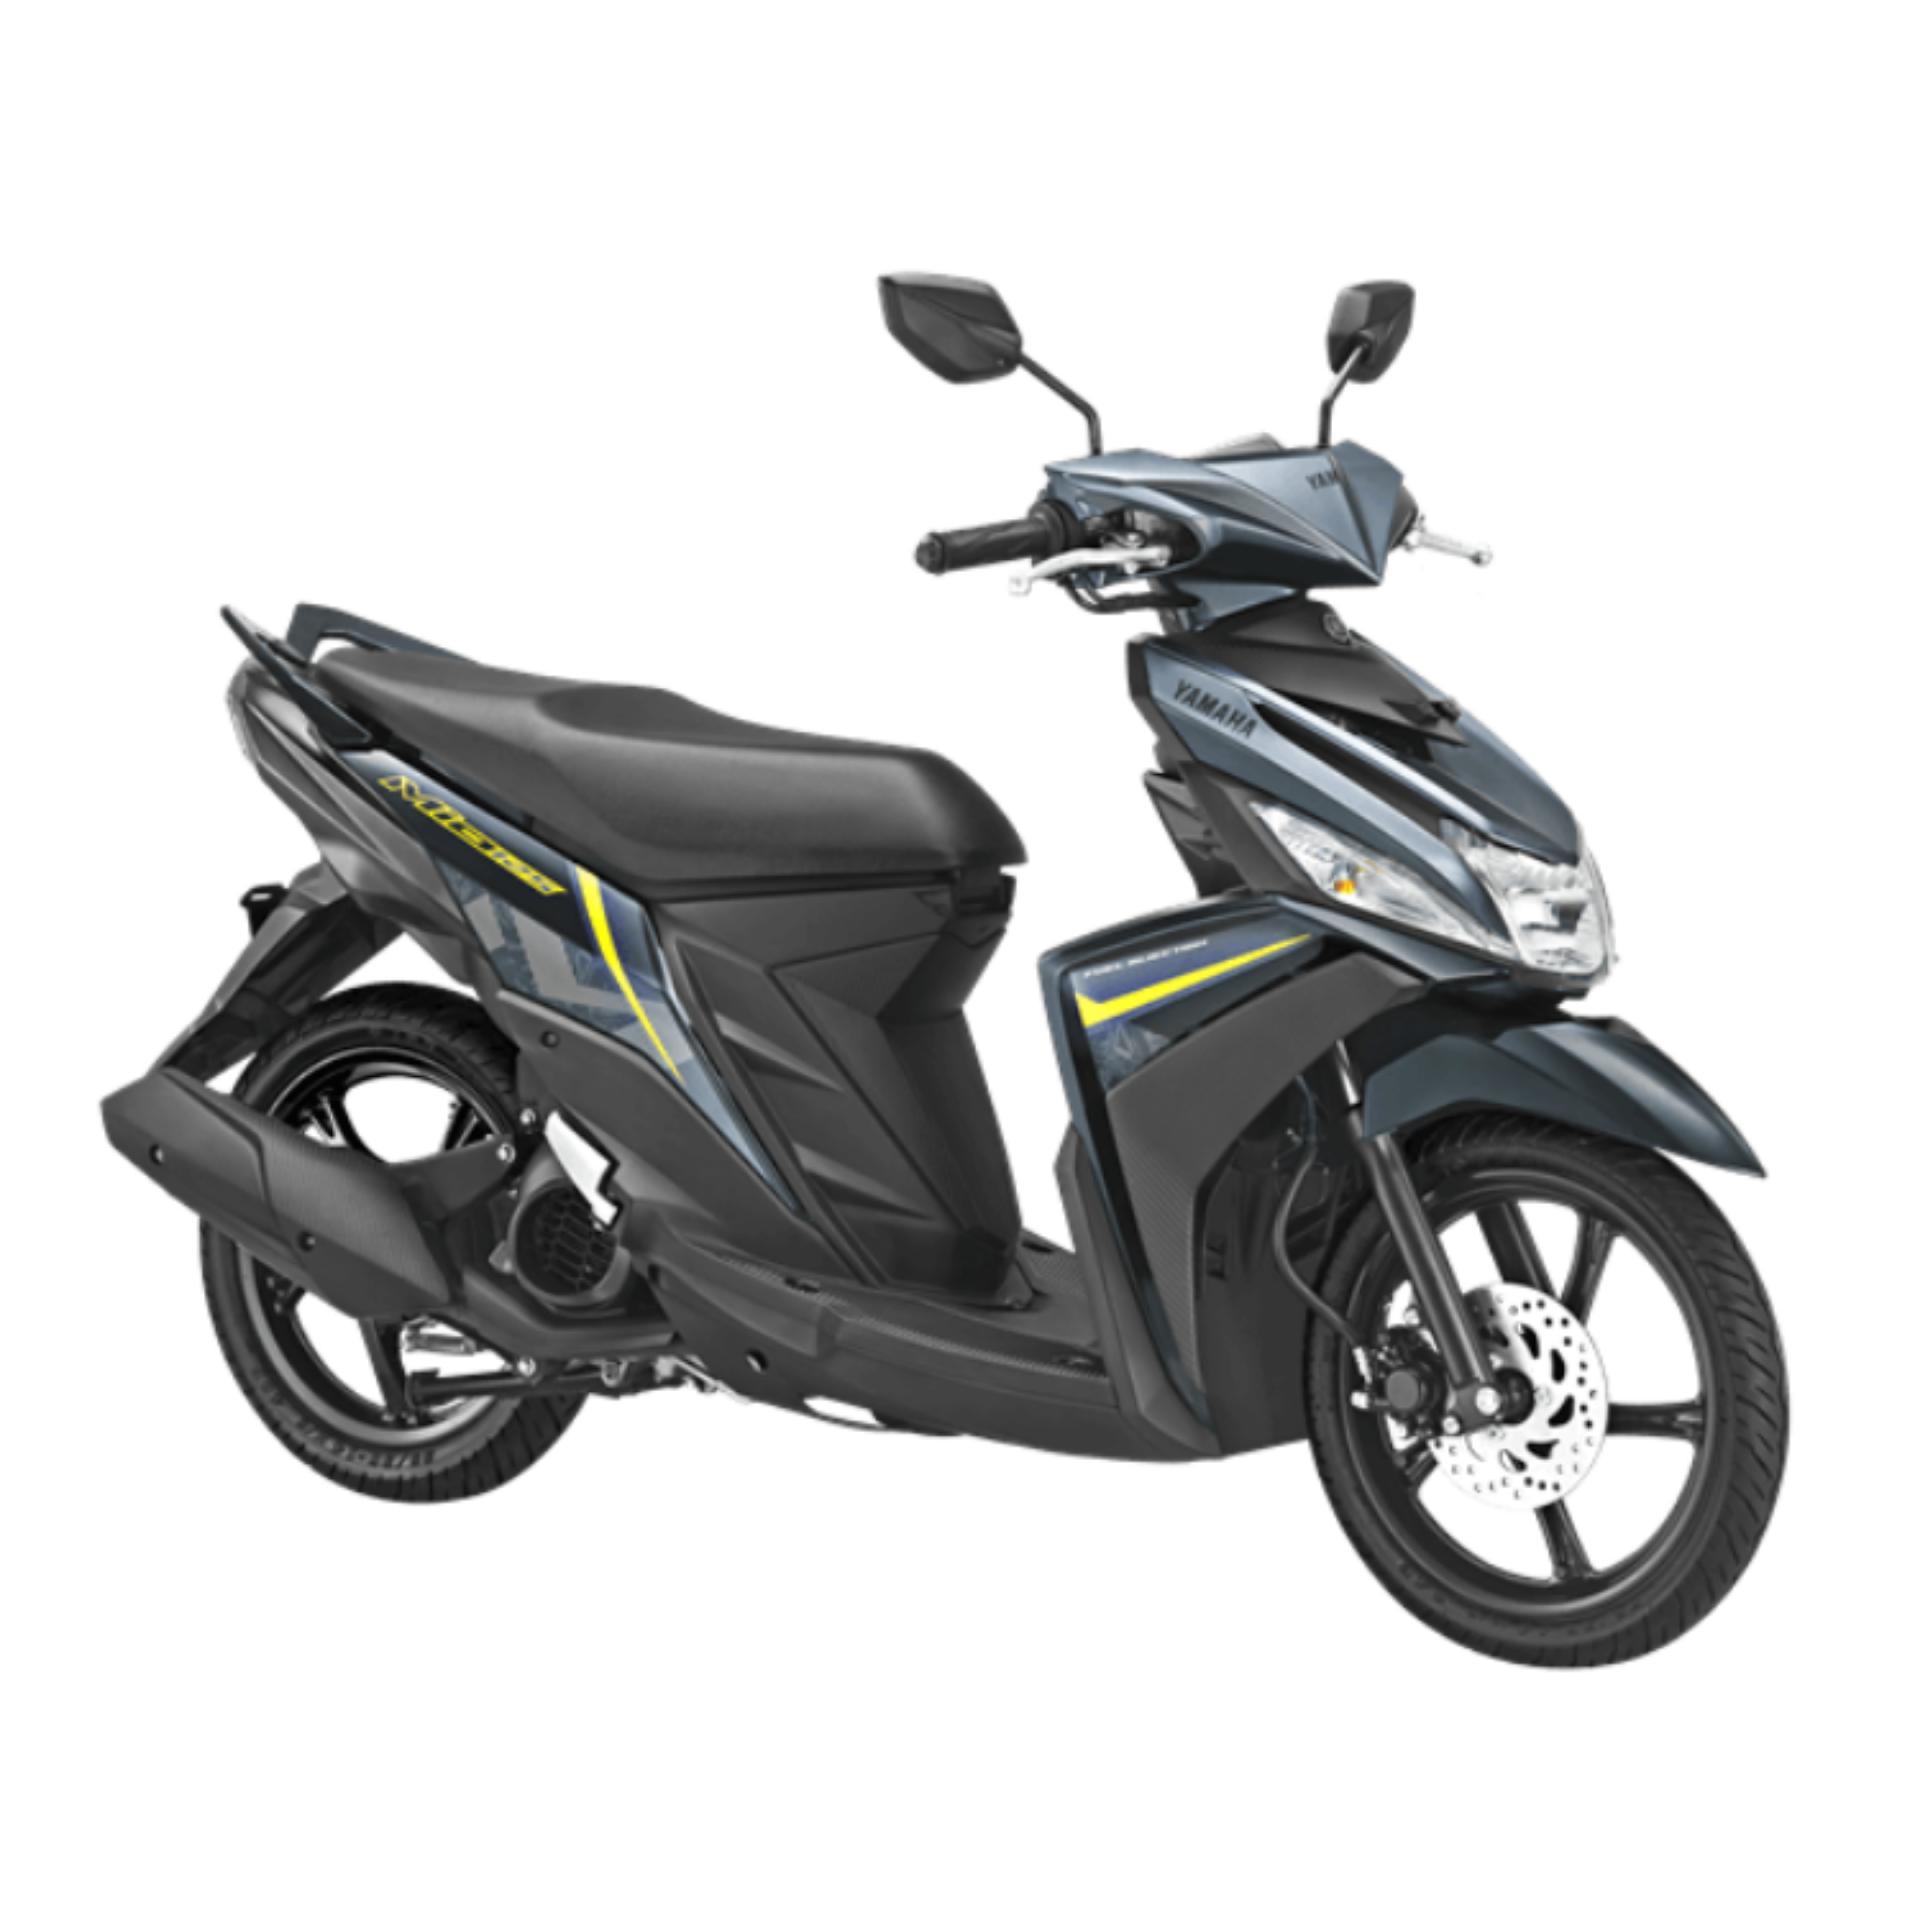 Yamaha Mio M3 125 Cw Amazing Black Jakarta Banten Dki Jakarta Diskon 50